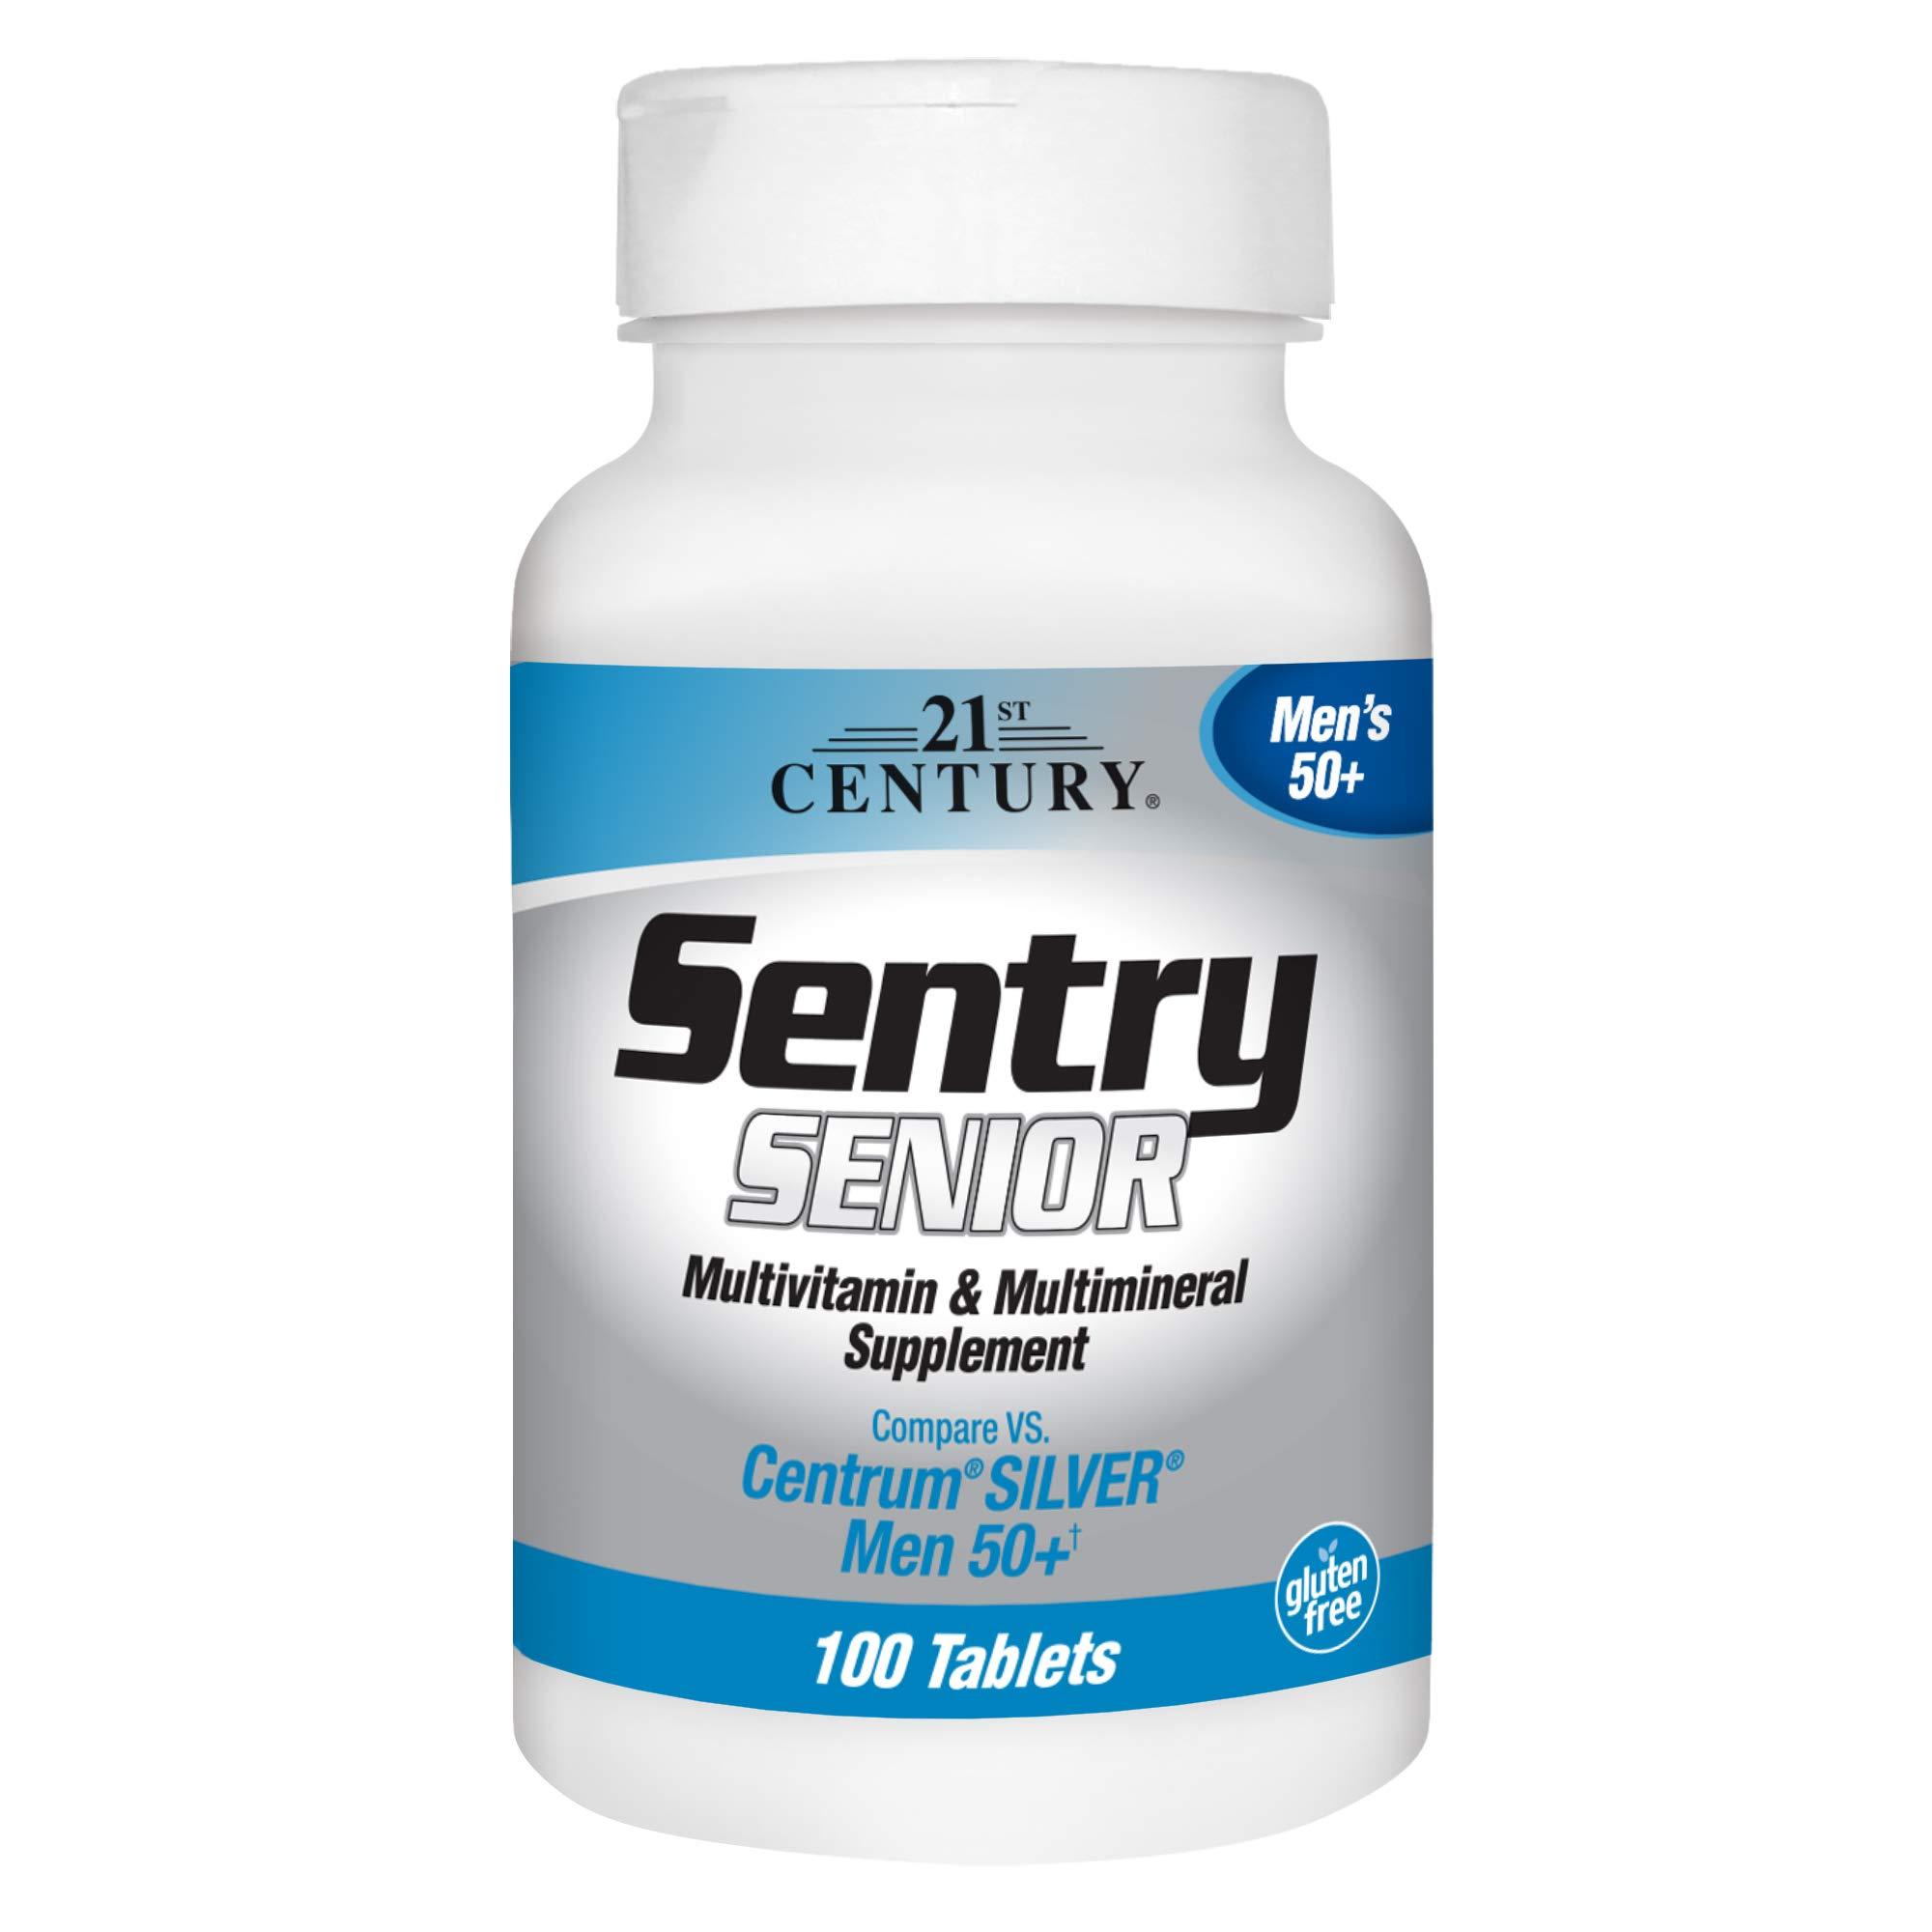 21st Century Sentry Senior Men 50Plus Tablets, White Unscented 100 Count